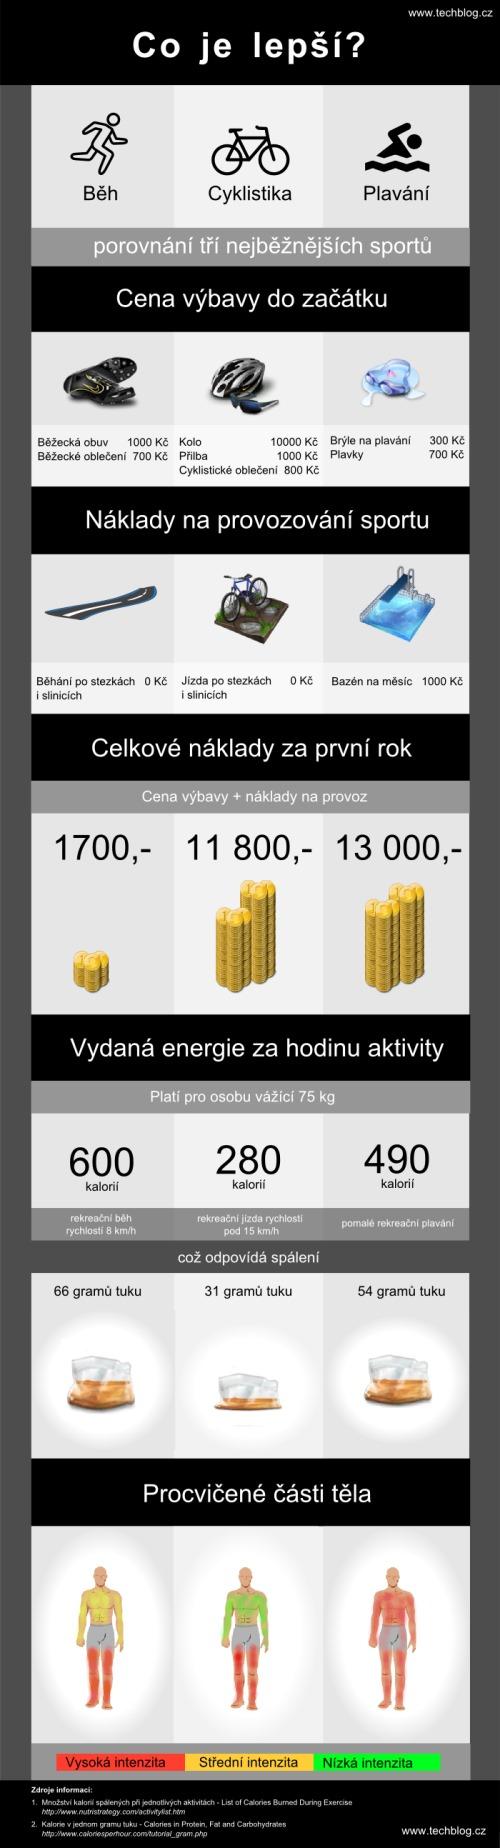 """Infografika,"